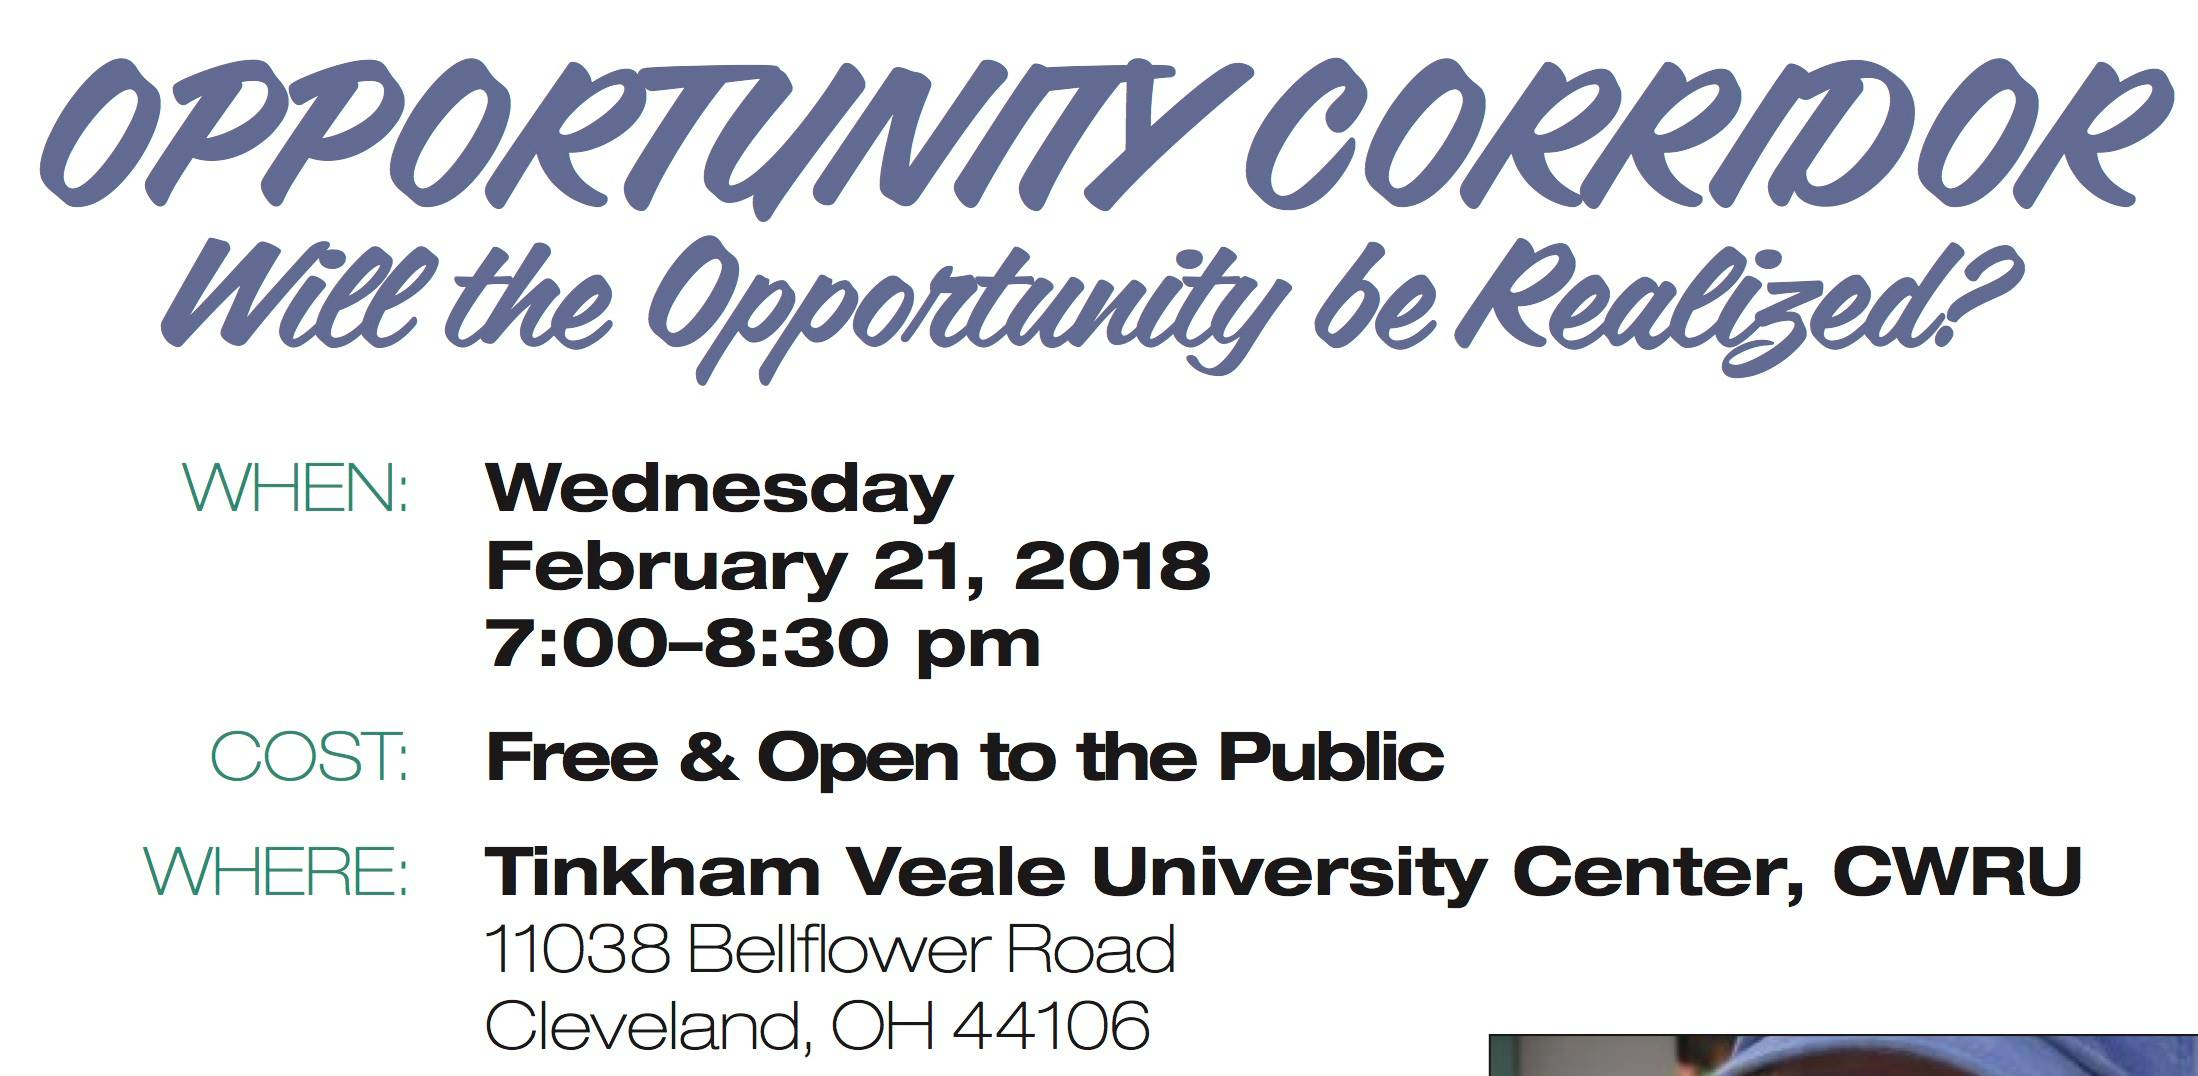 Opportunity Corridor Meeting at CWRU